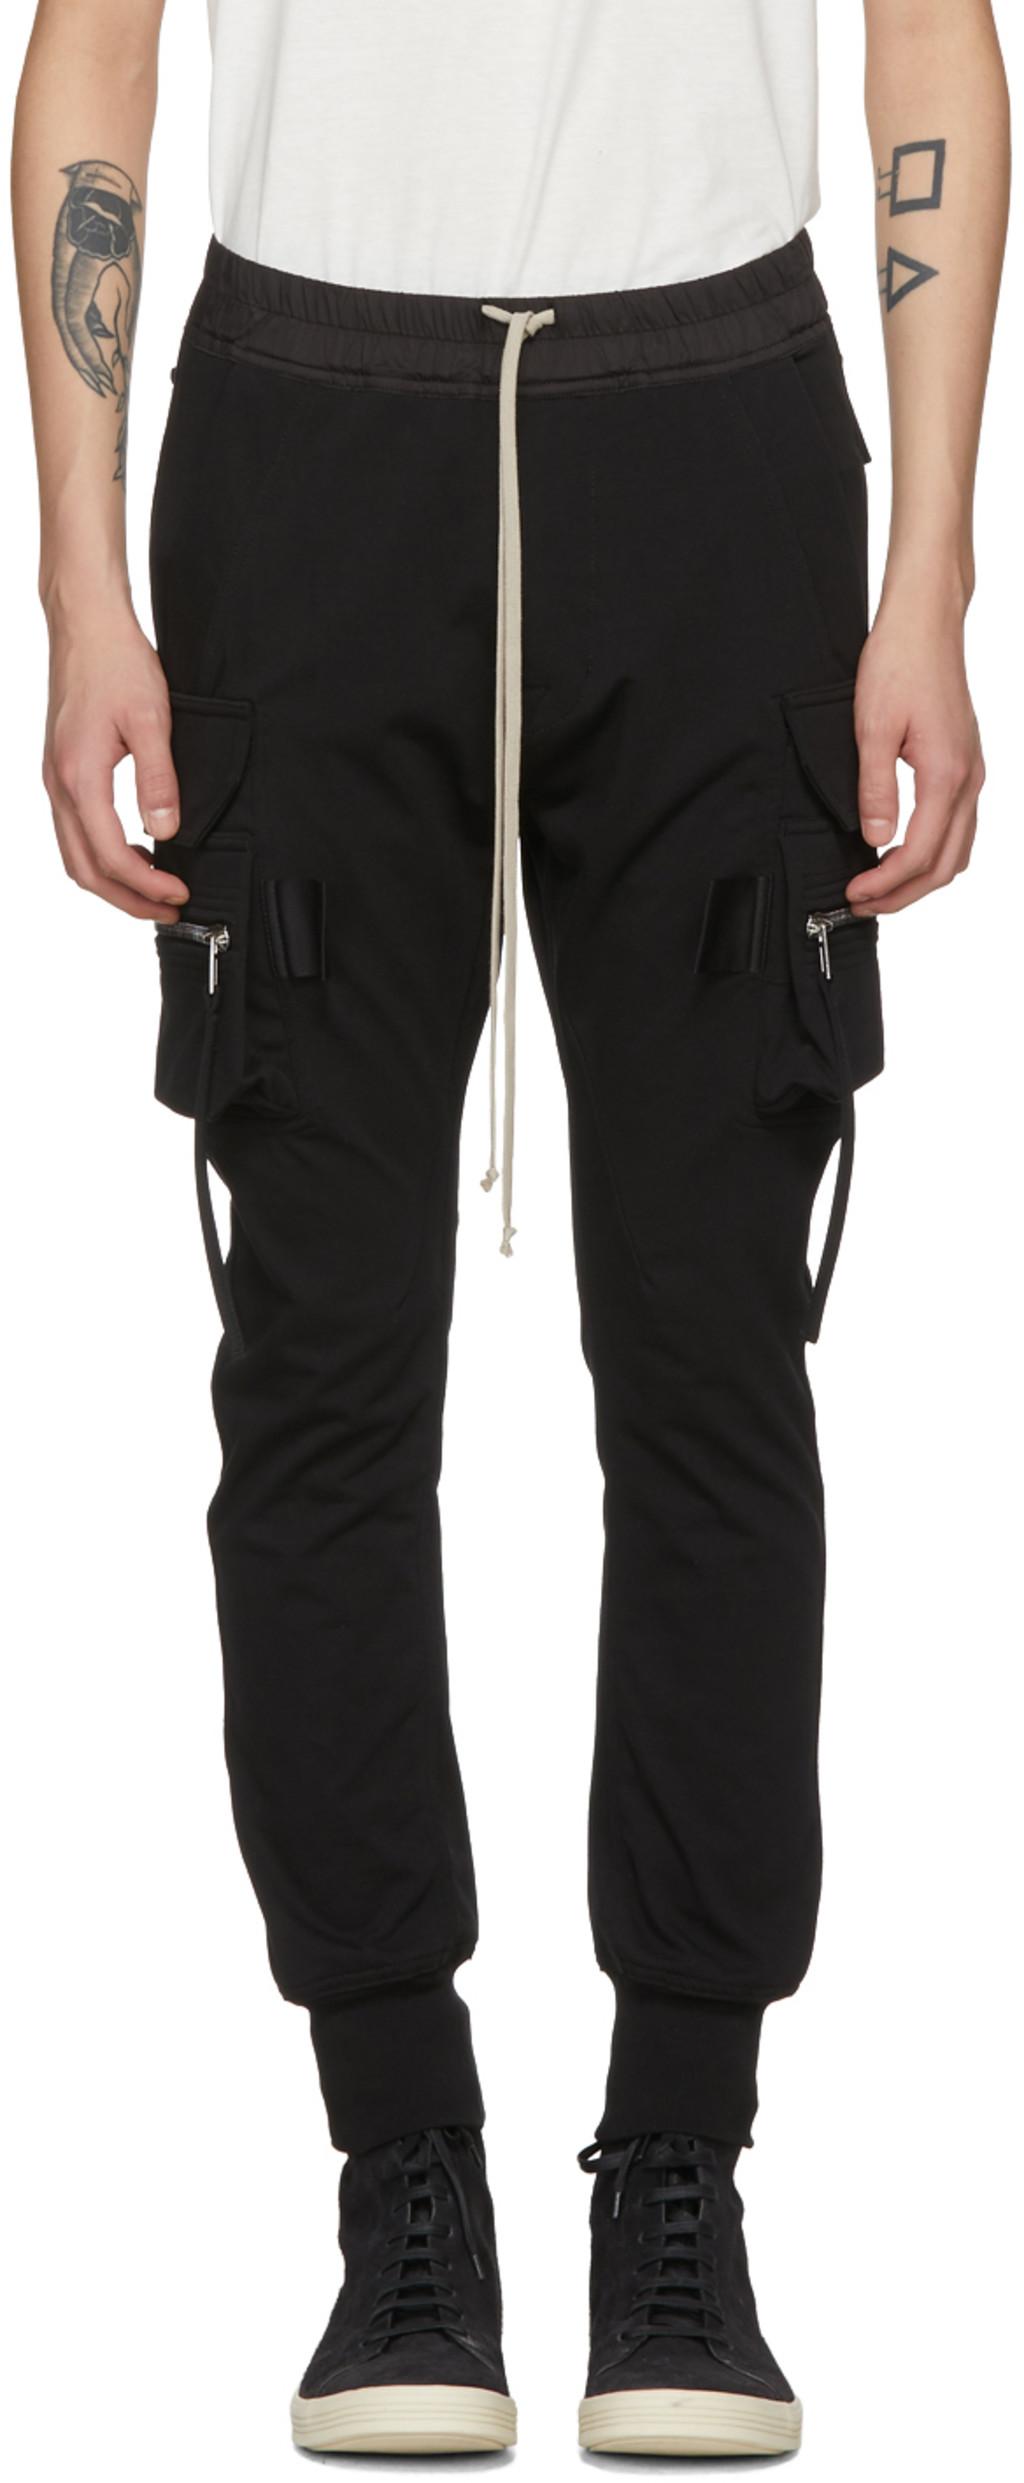 Rick Owens cargo trousers 2018 Newest e8Hh5kQKPE